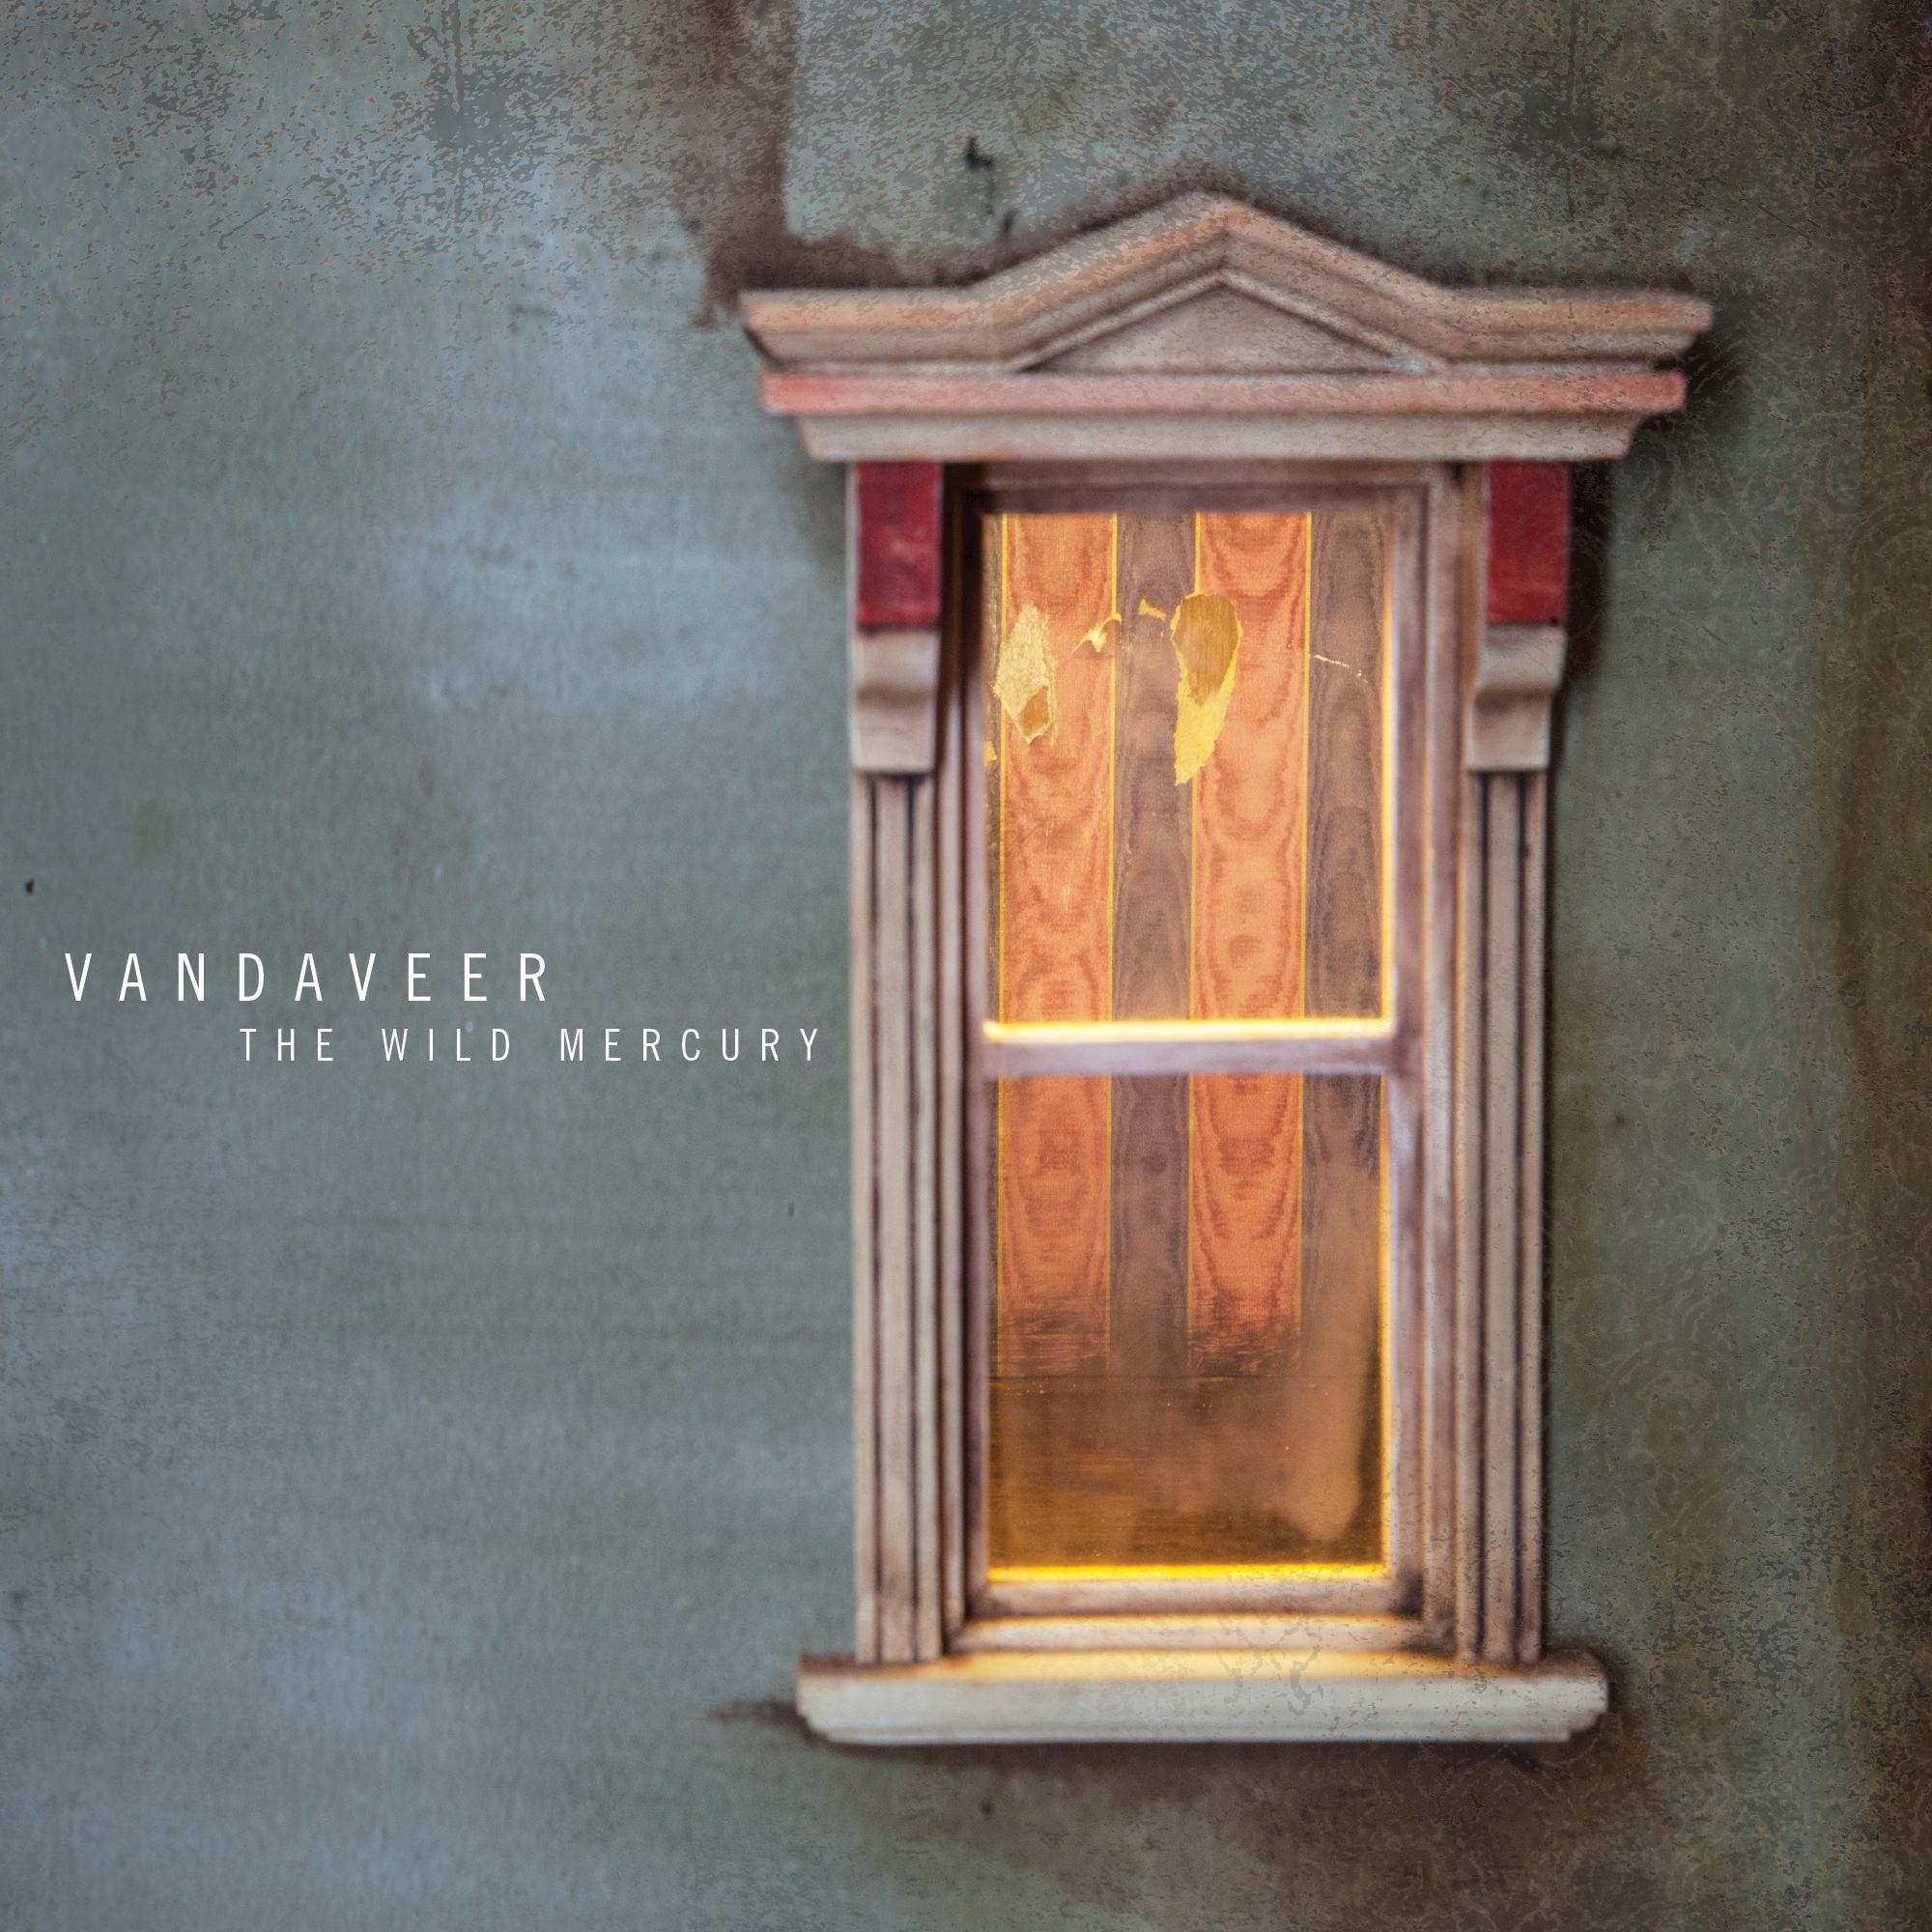 Vandaveer - The Wild Mercury